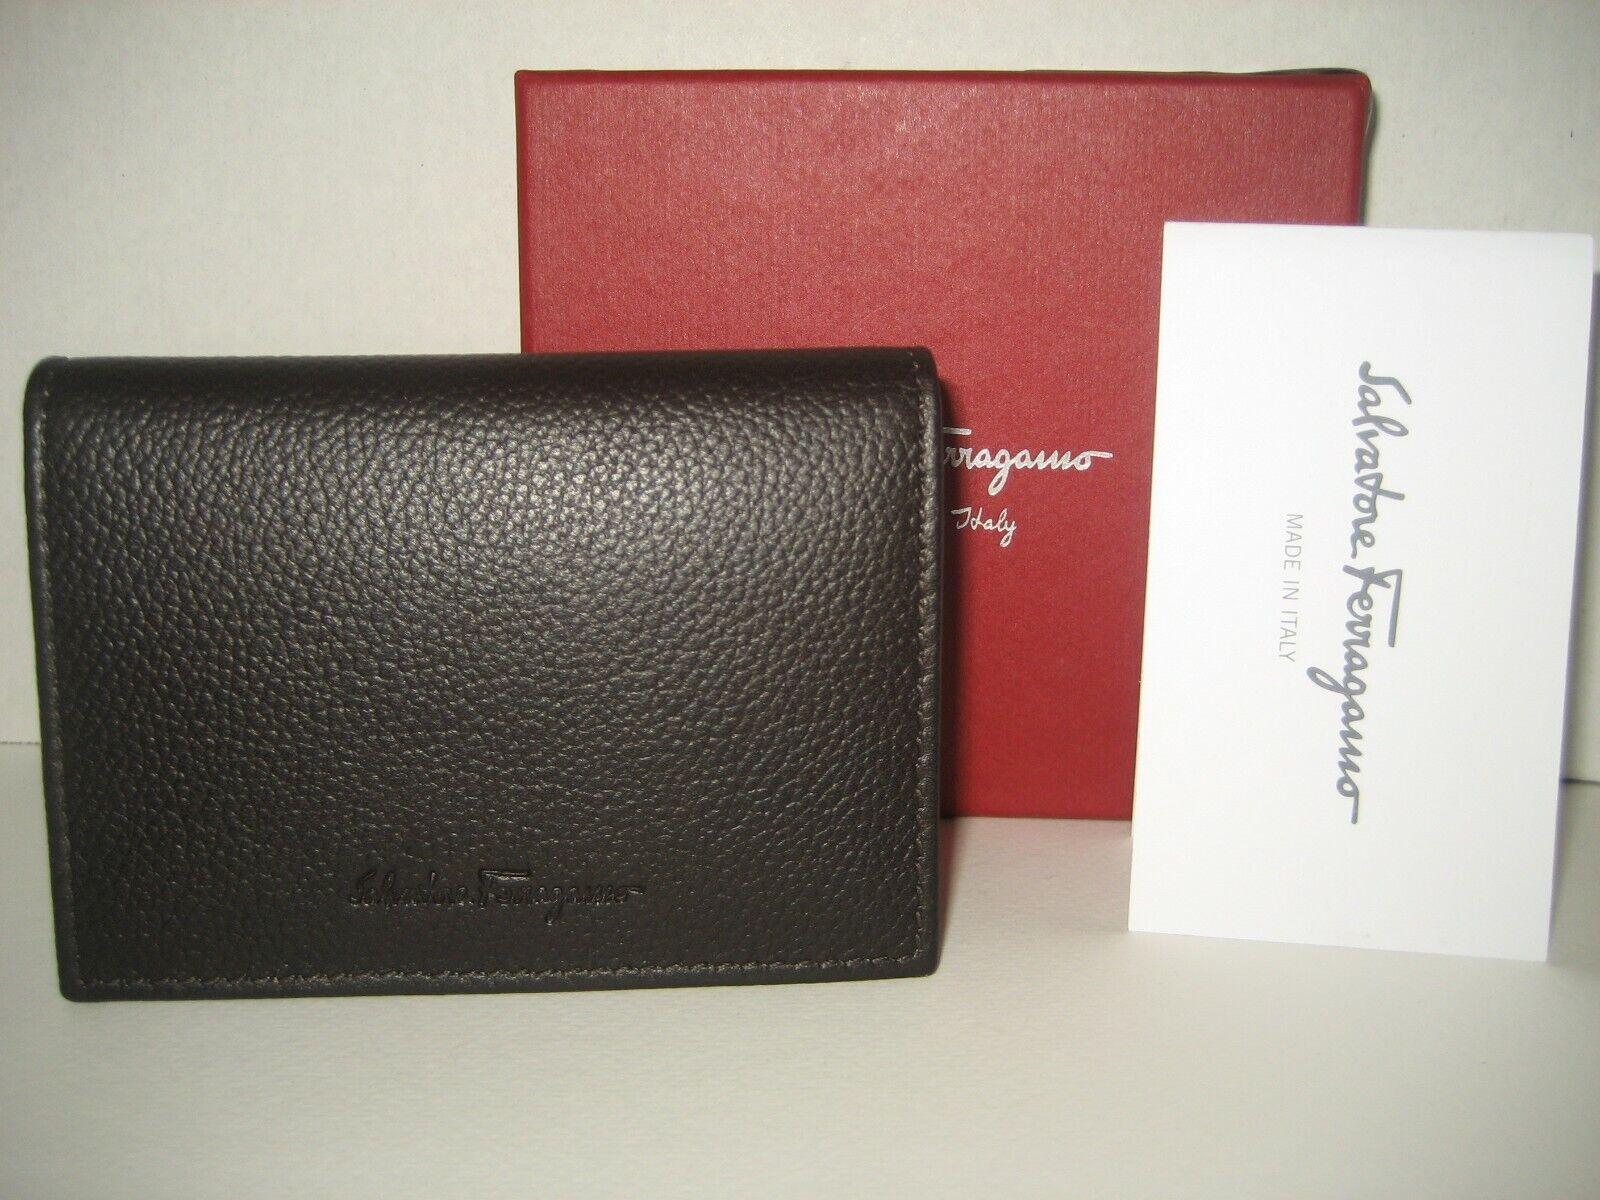 NEW Salvatore Ferragamo Brown Leather Bifold ID Card Cash Case Wallet Box